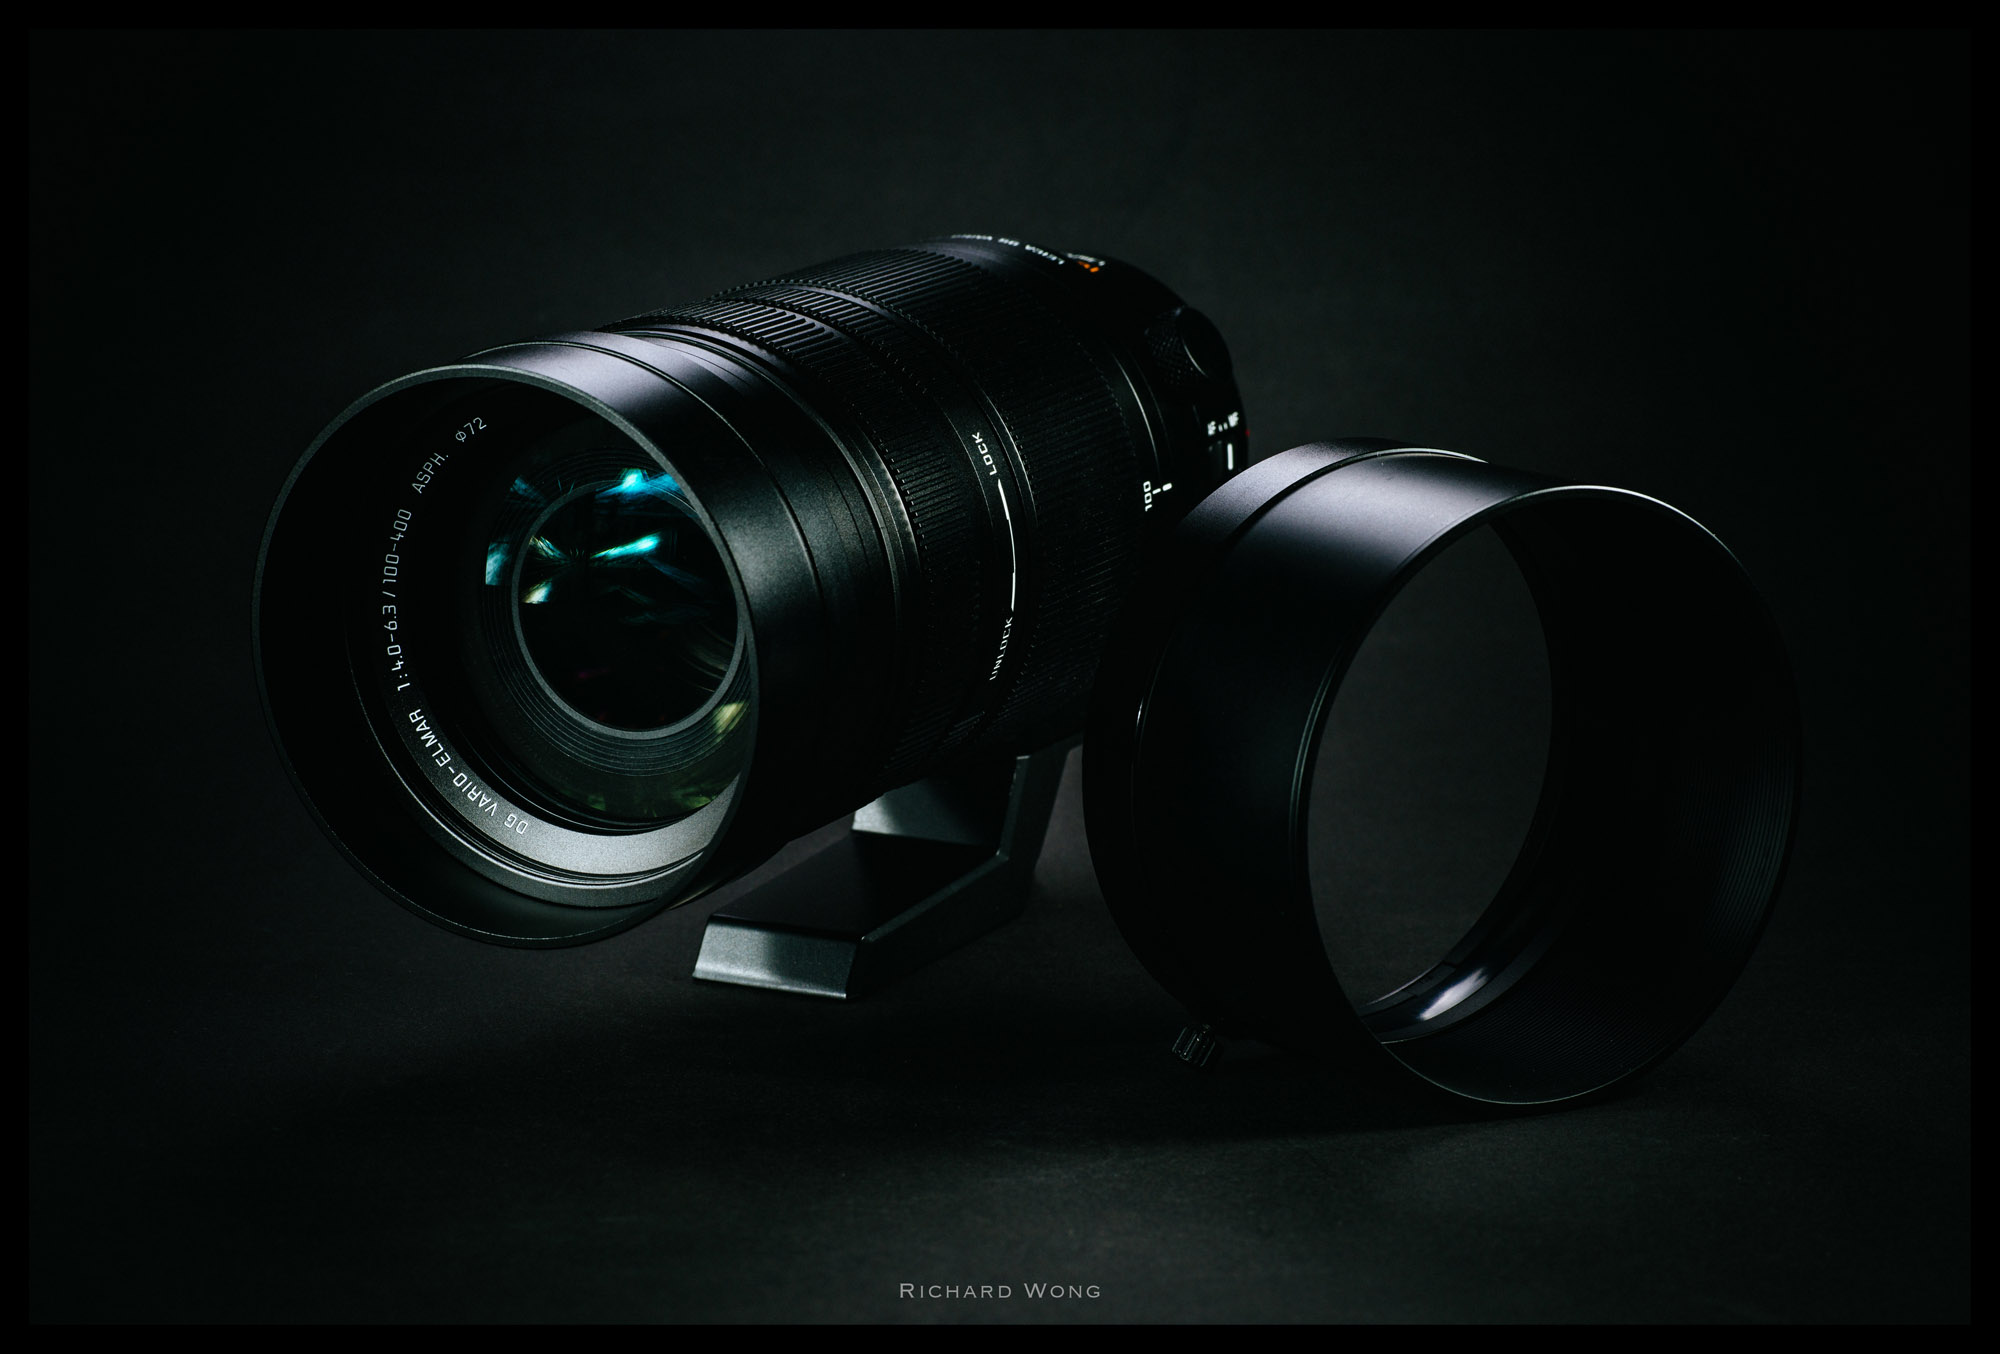 Panasonic-Leica-100-400-review-02